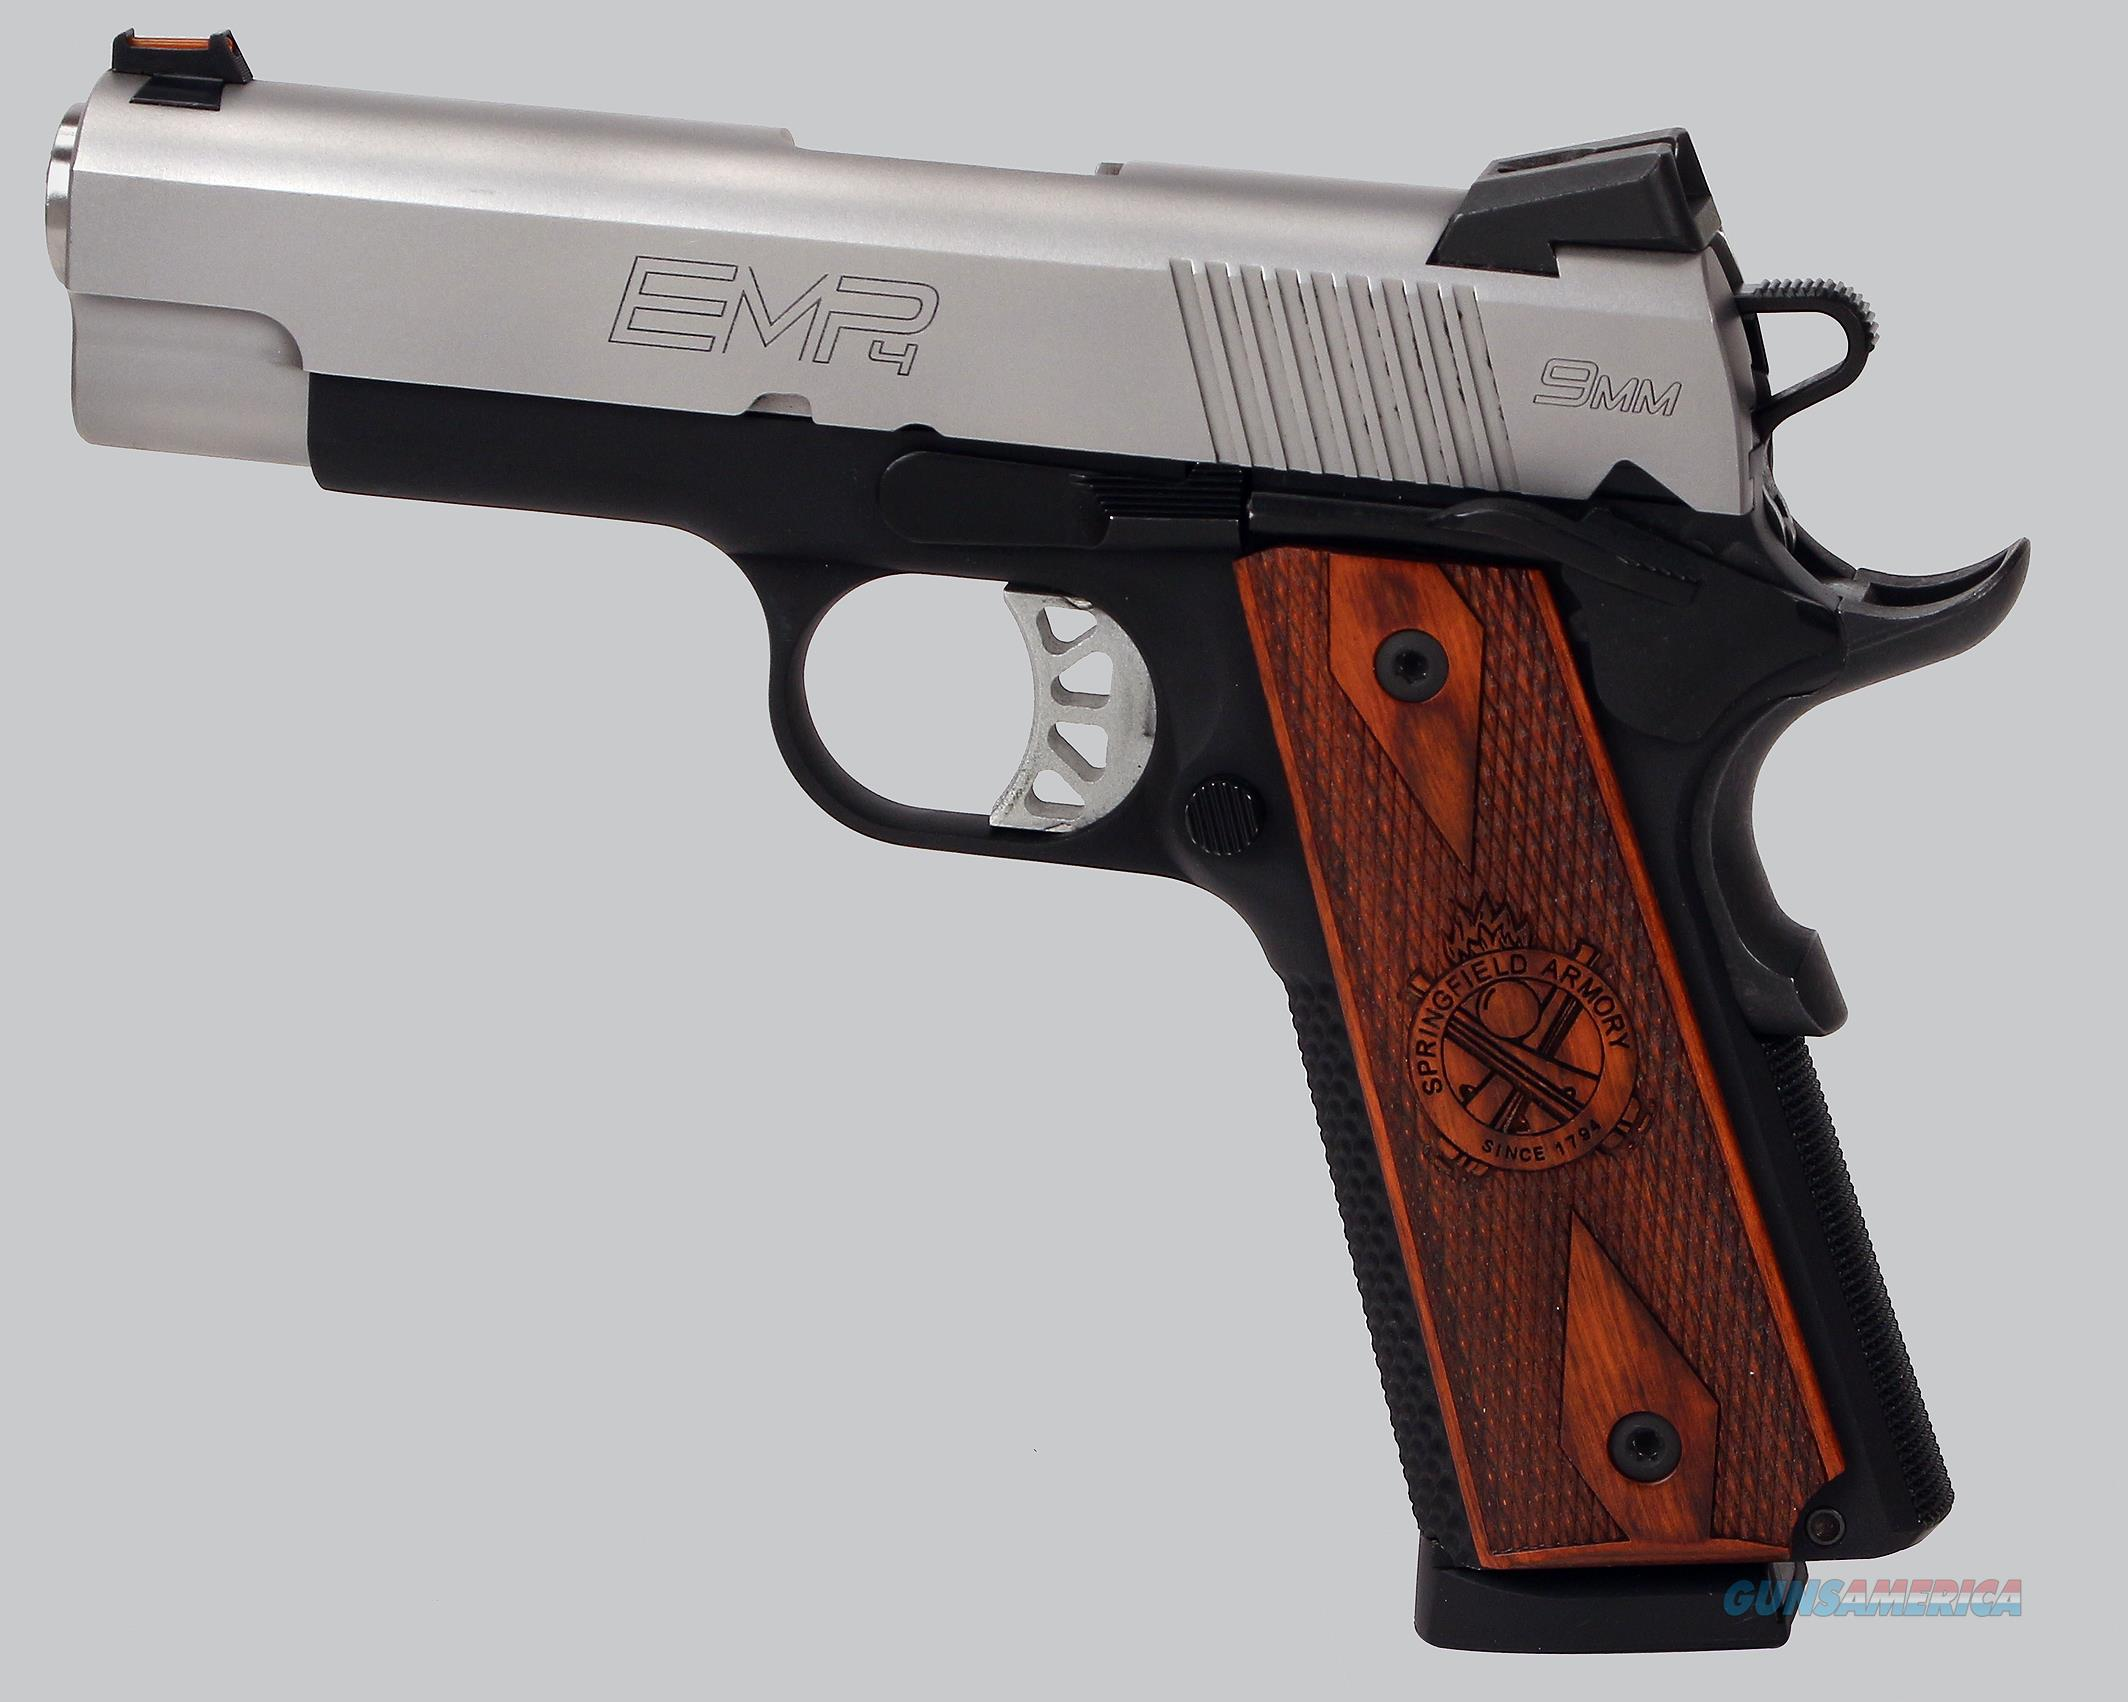 Springfield Armory 9mm EMP 4 Pistol